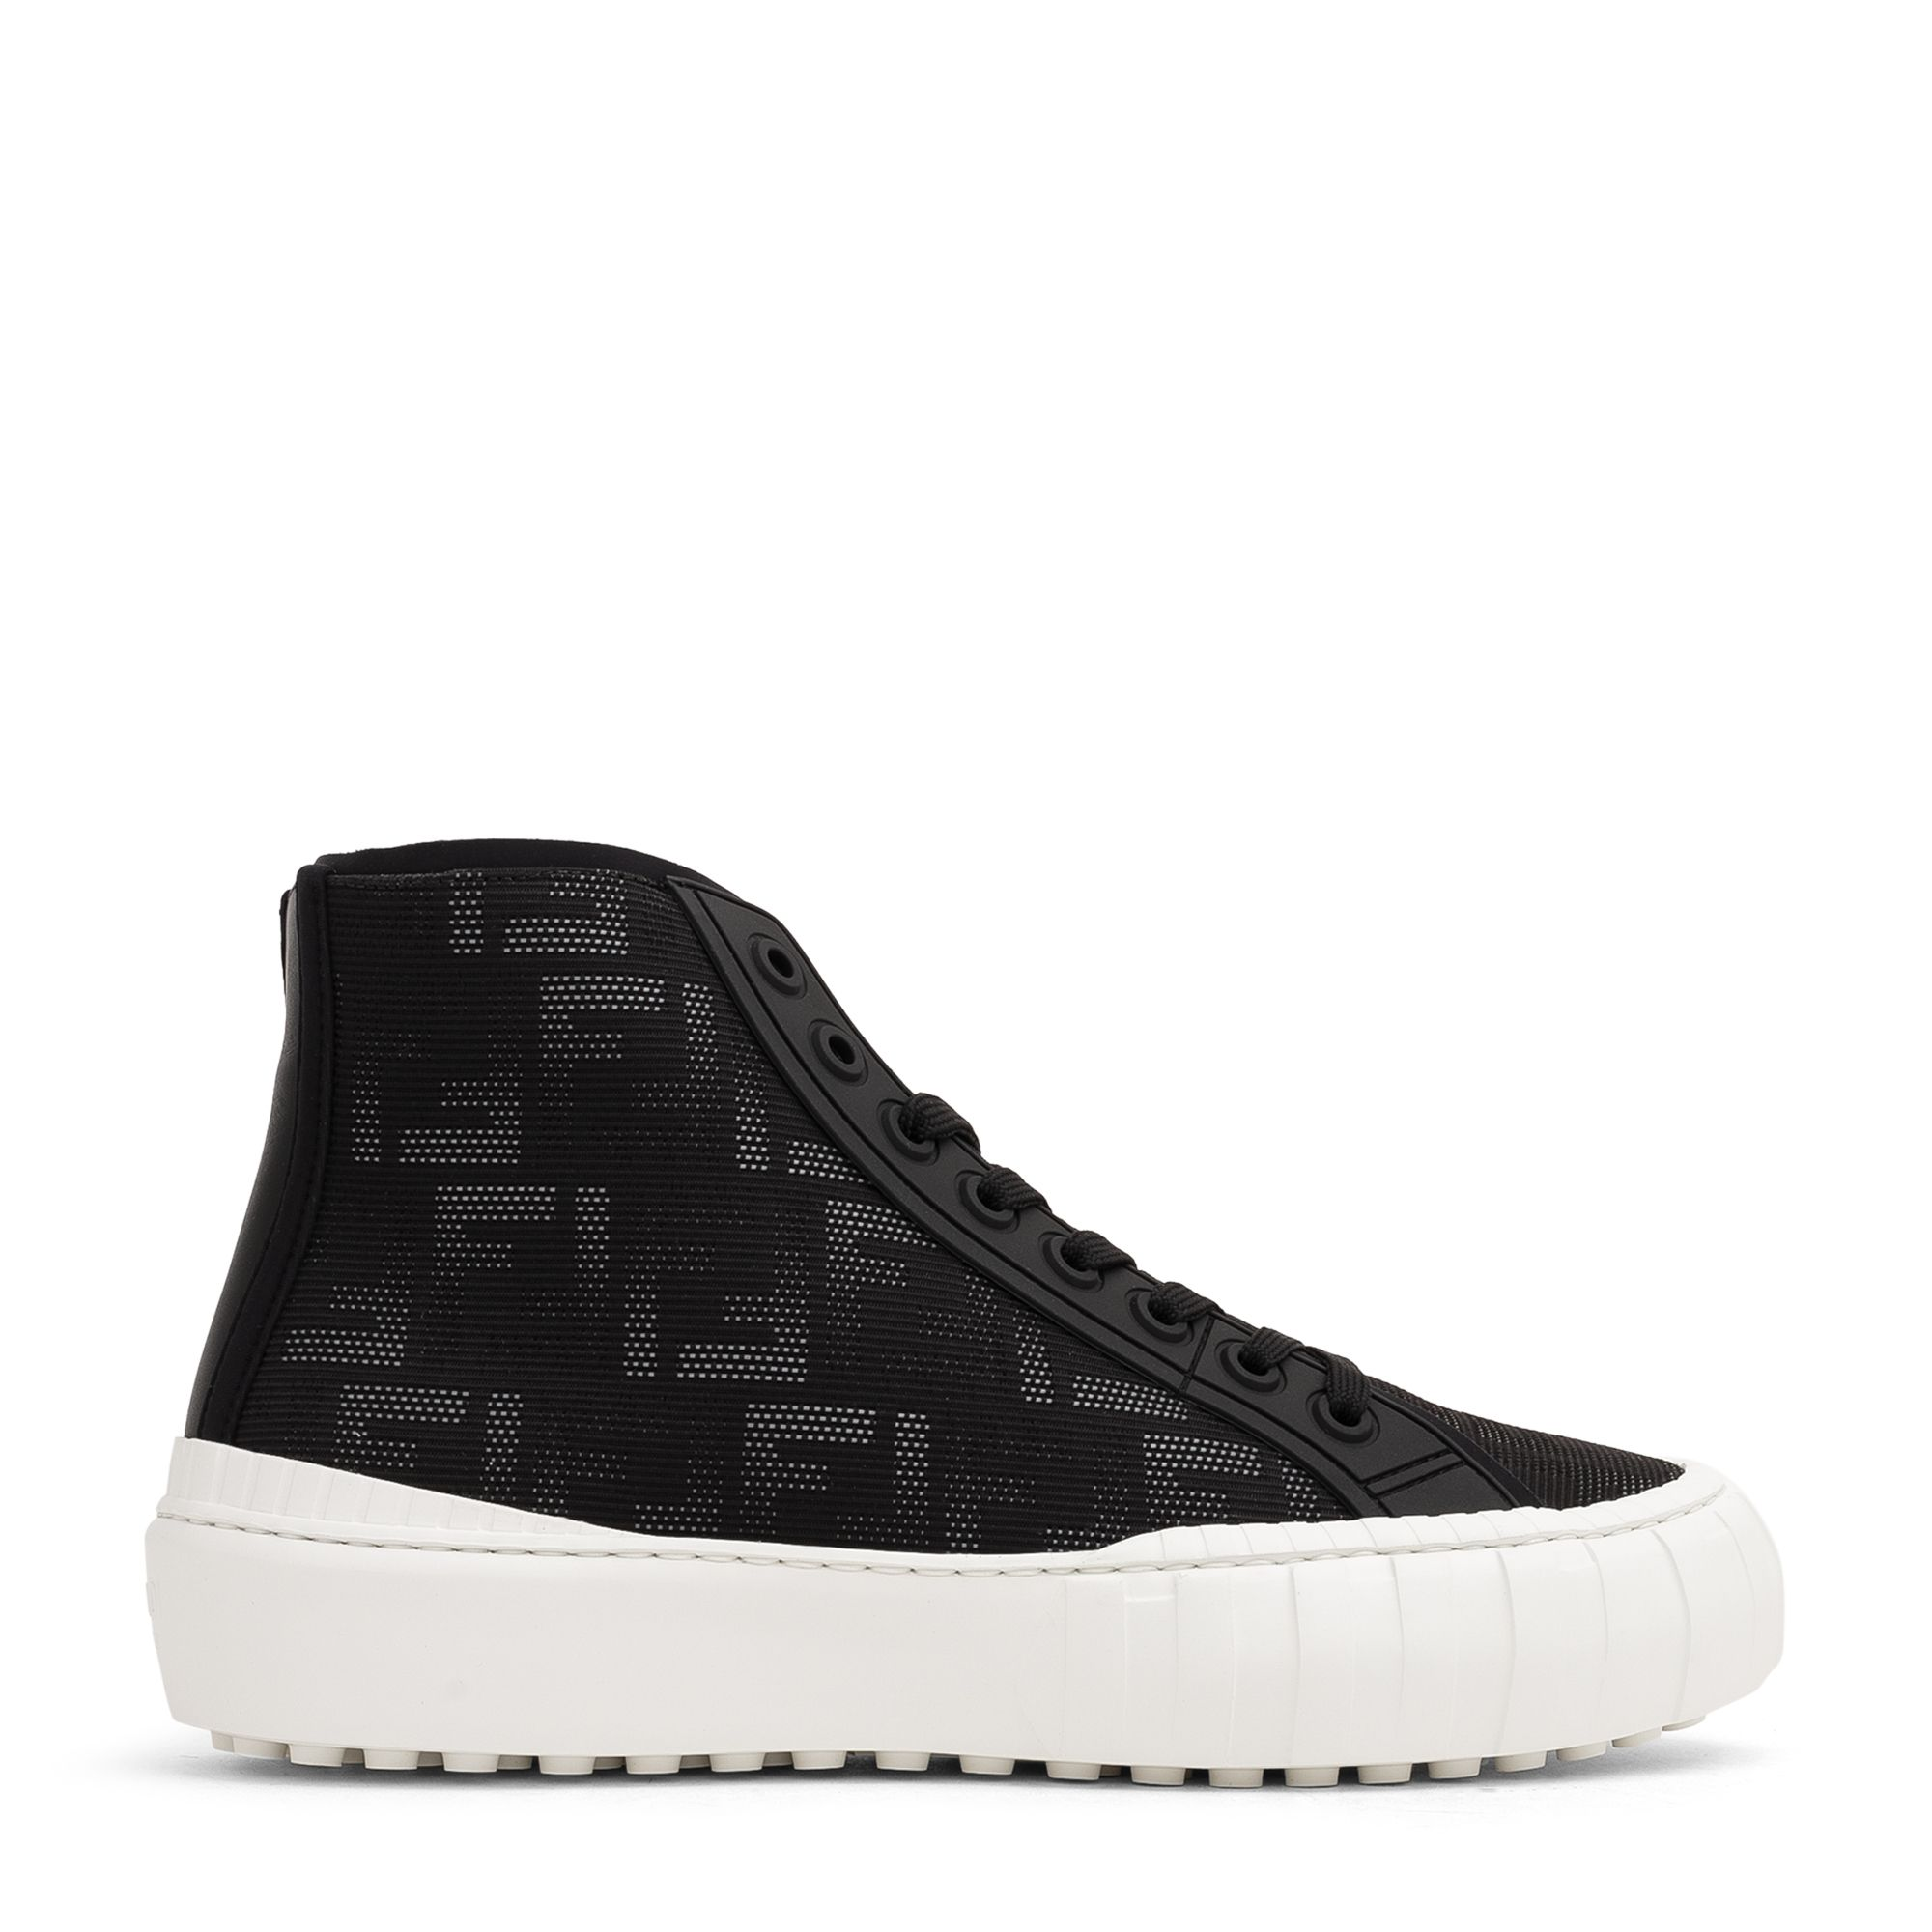 FF Flash high-top sneakers